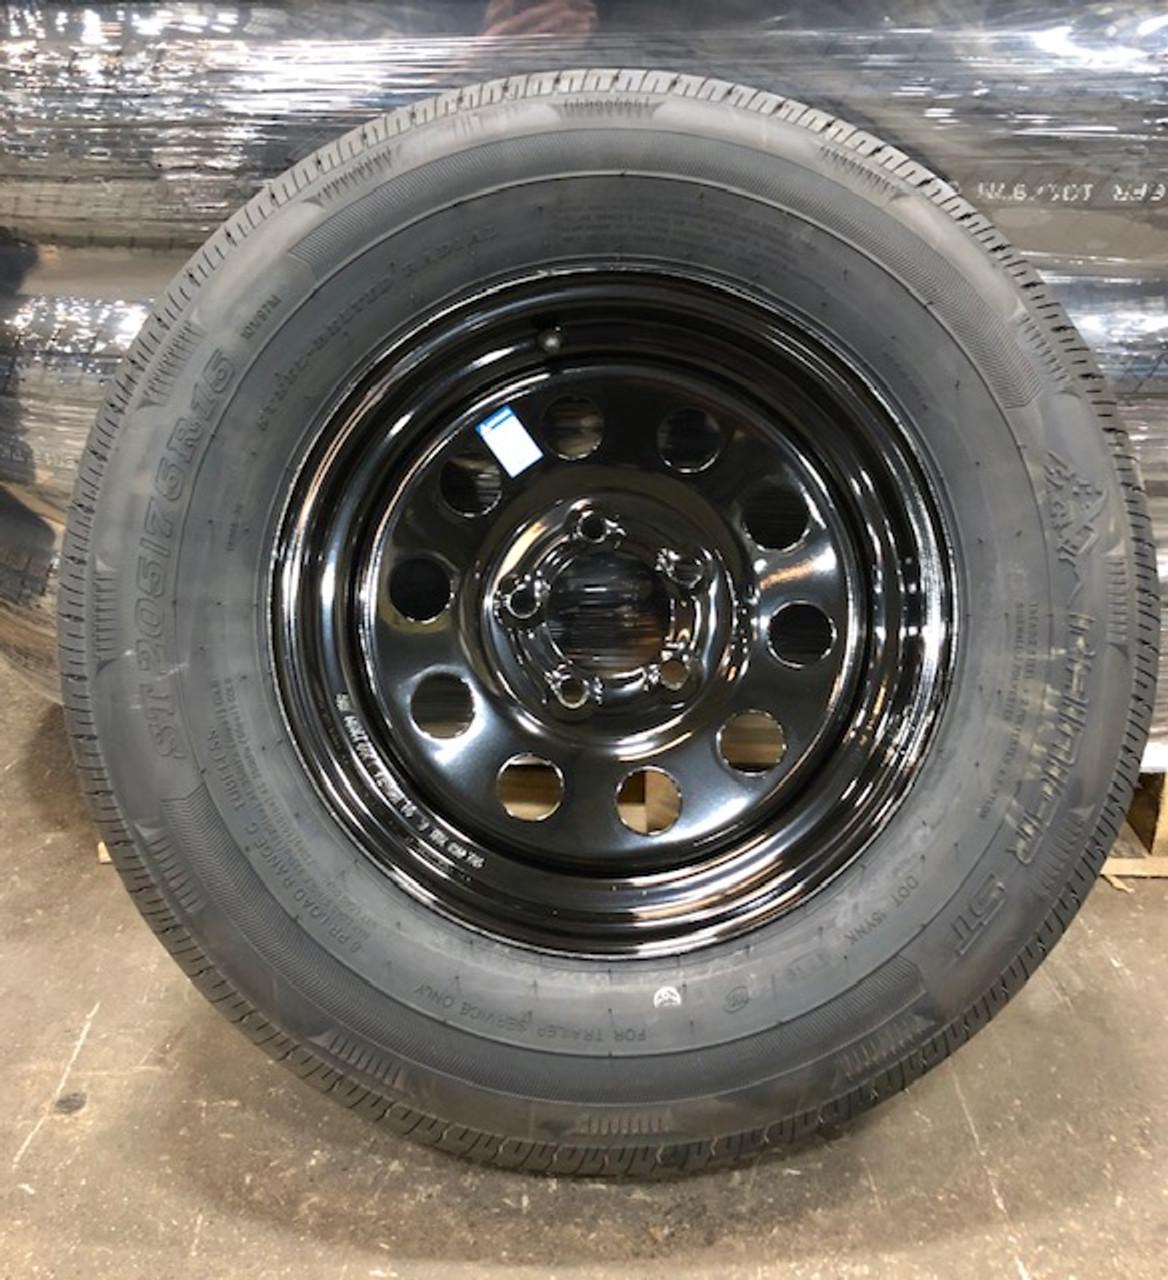 Tire  Radial 205/75R15C on 5 Hole 545 Black Mod Wheel